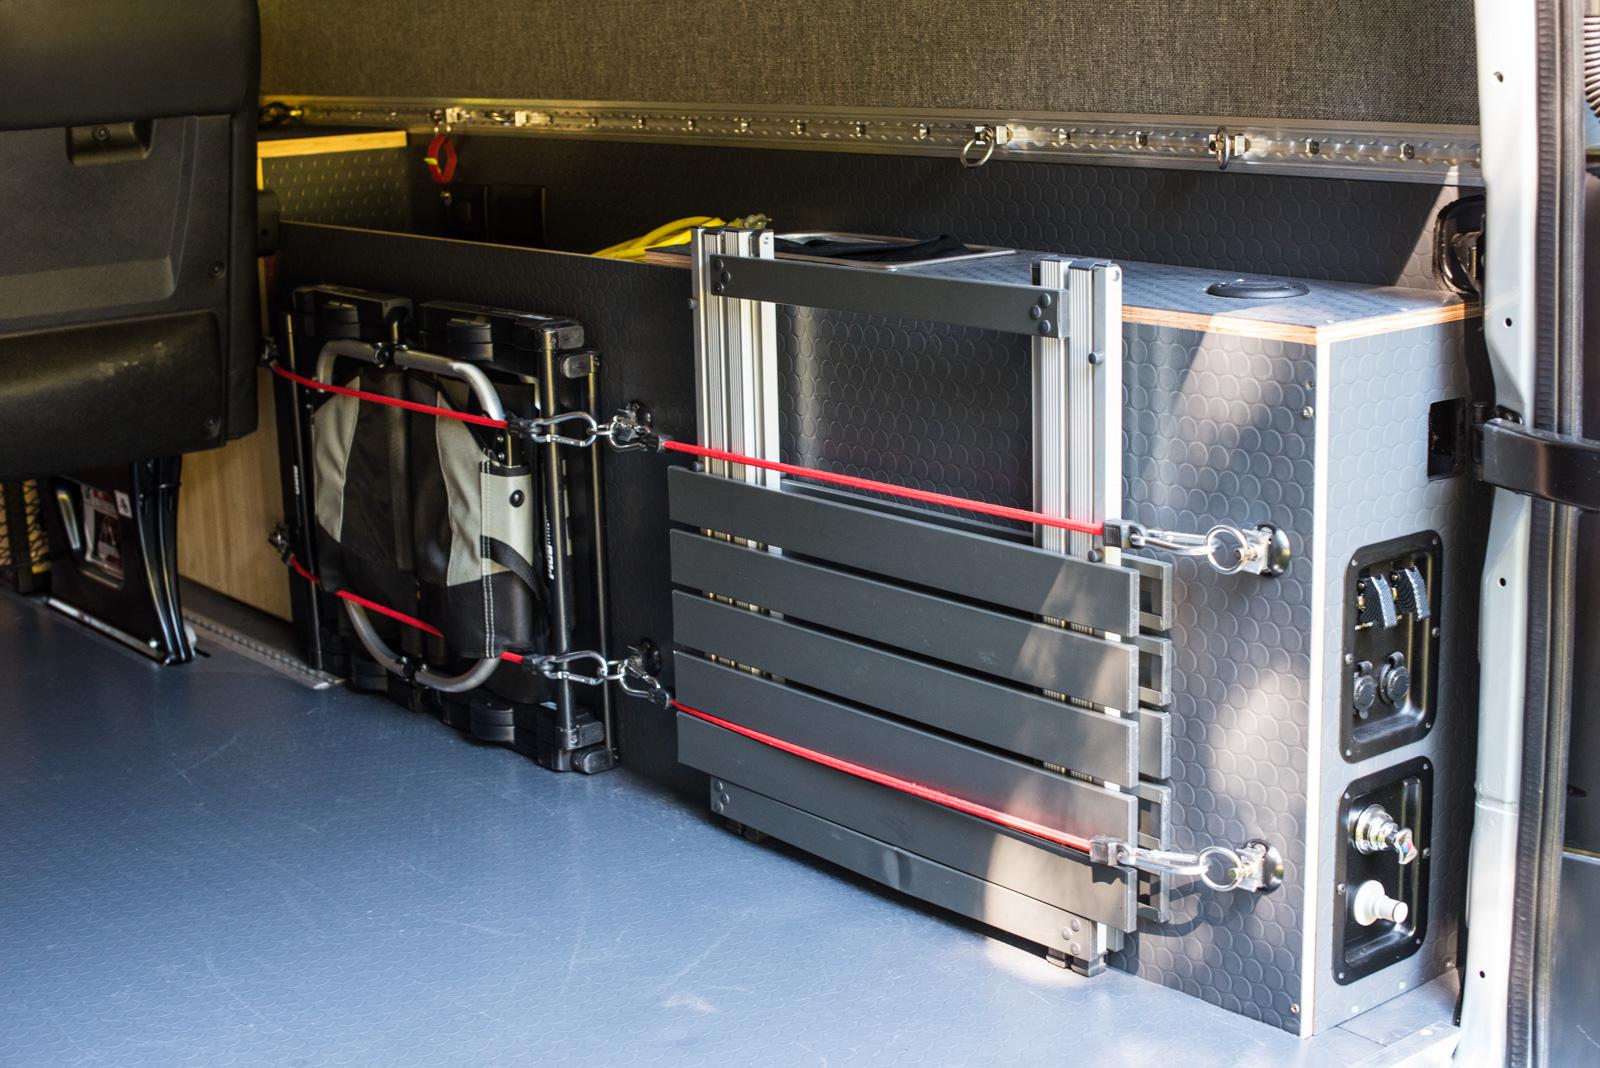 Water Tank Rear Shower Storage Area In Passenger Side Of Van